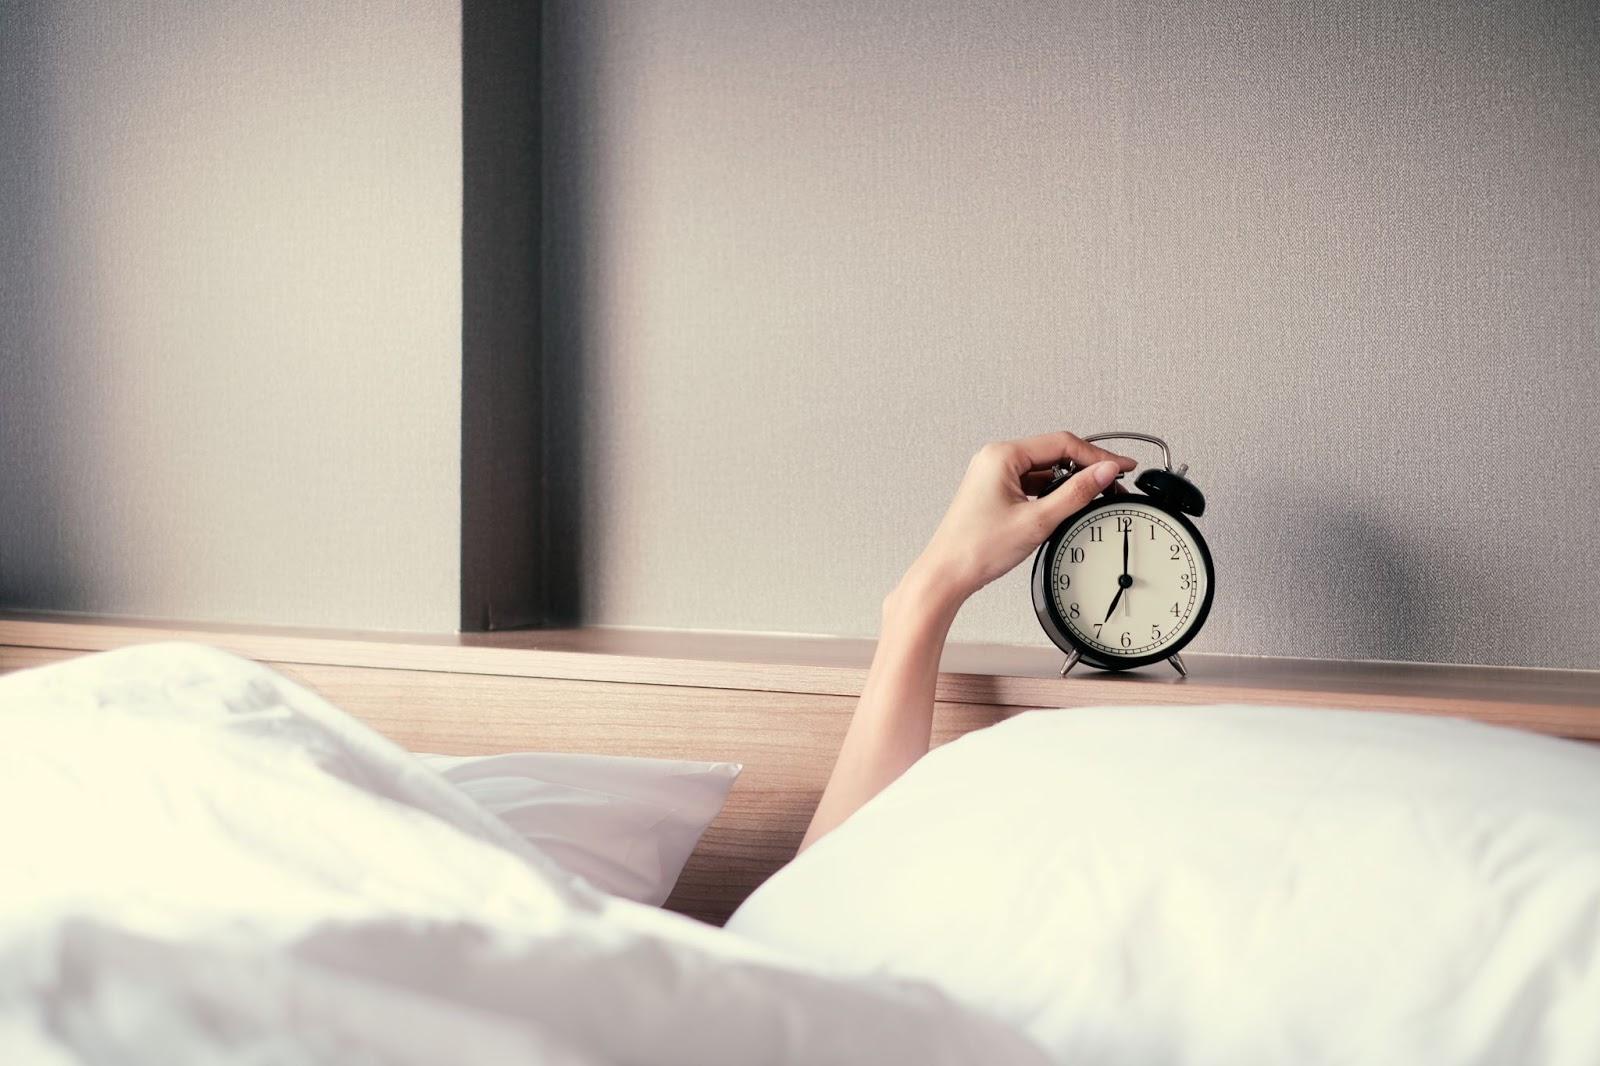 Natural energy: A hand reaches for an alarm clock